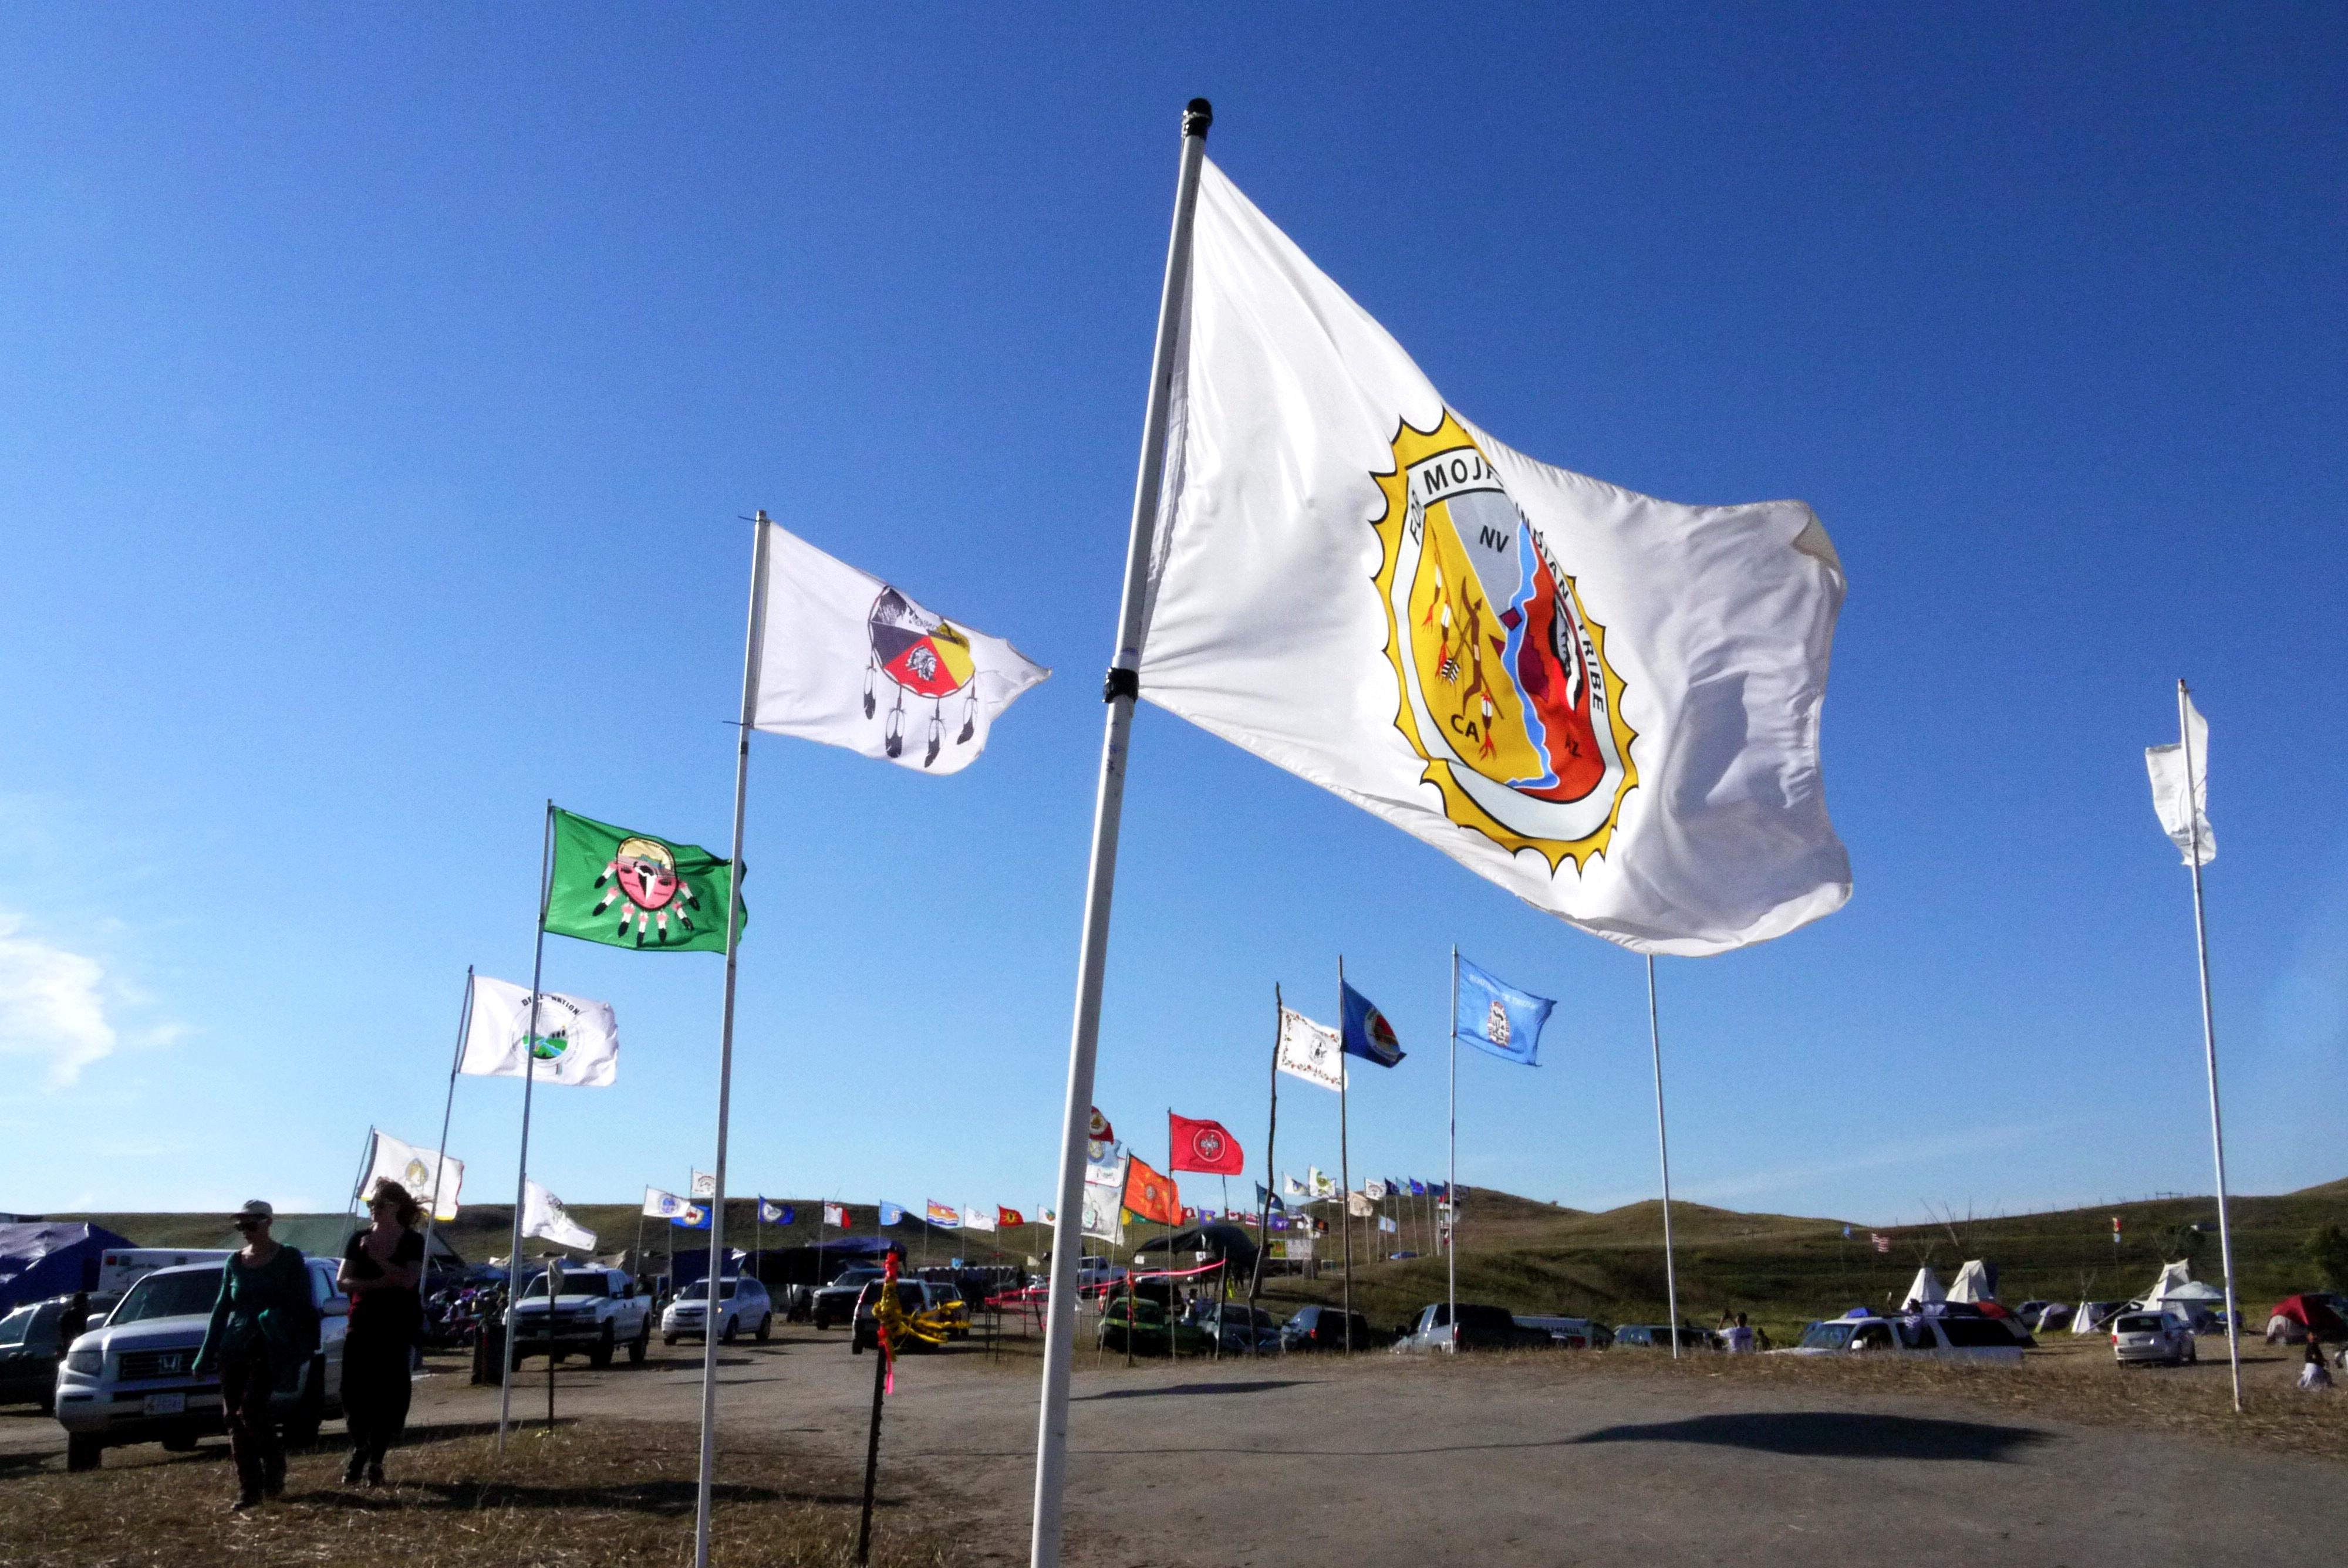 Flags at Oceti Sakowin camp, Sept. 14, 2016. (Sarah Jaffe for BillMoyers.com)